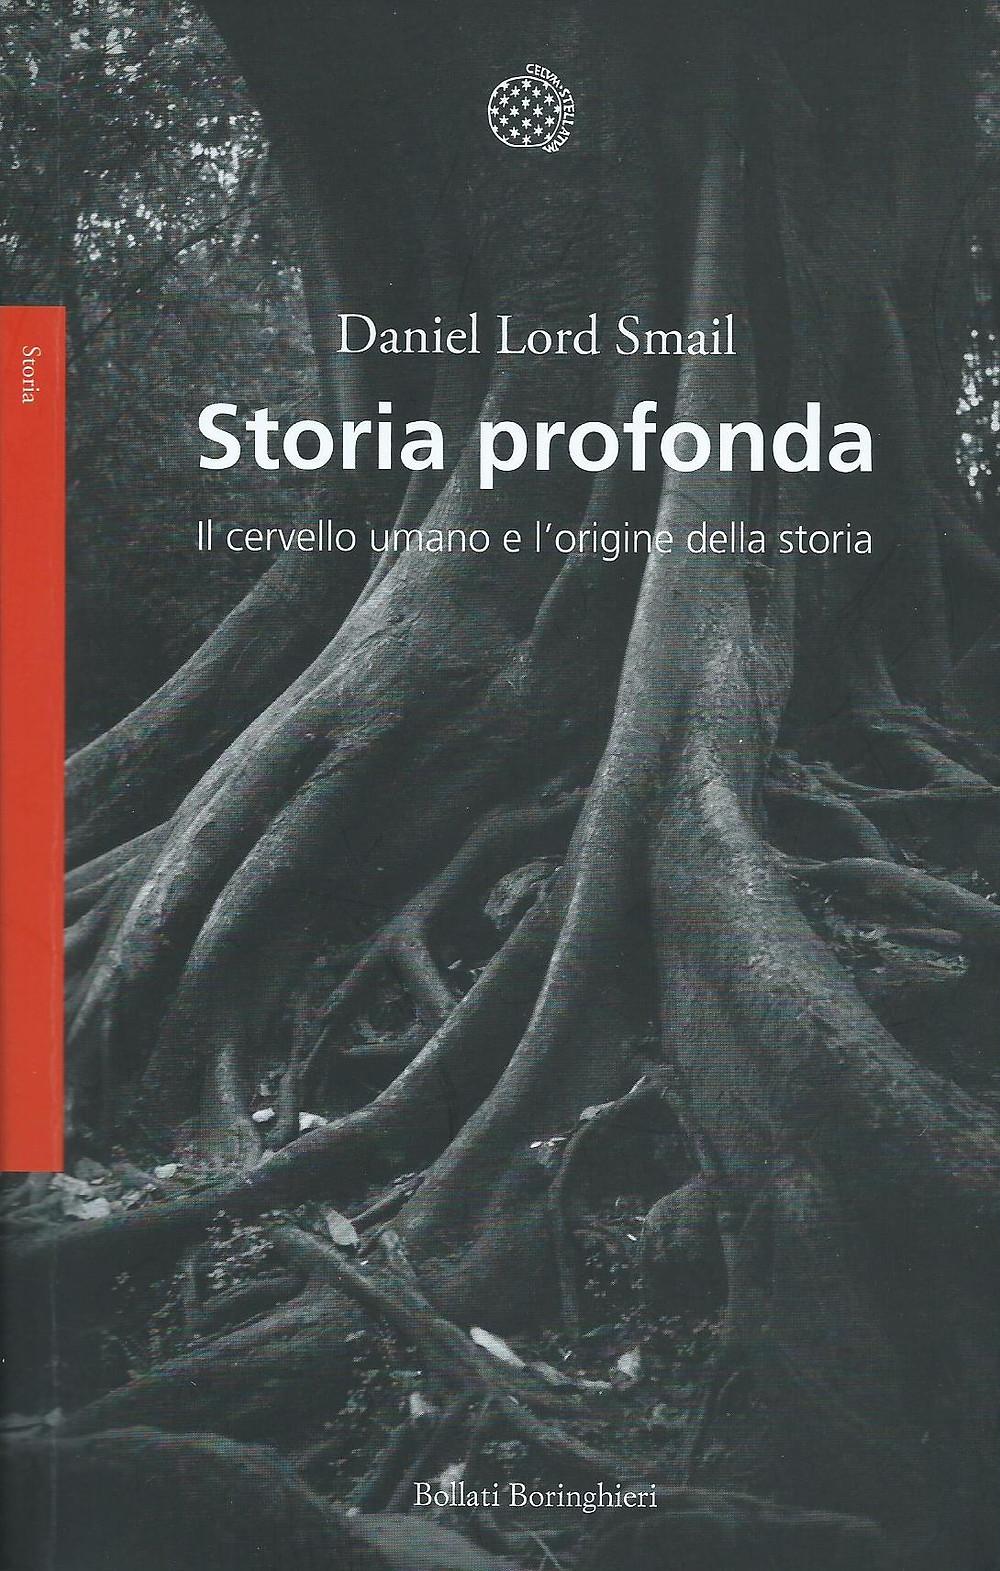 Daniel Lord Smail, Storia profonda